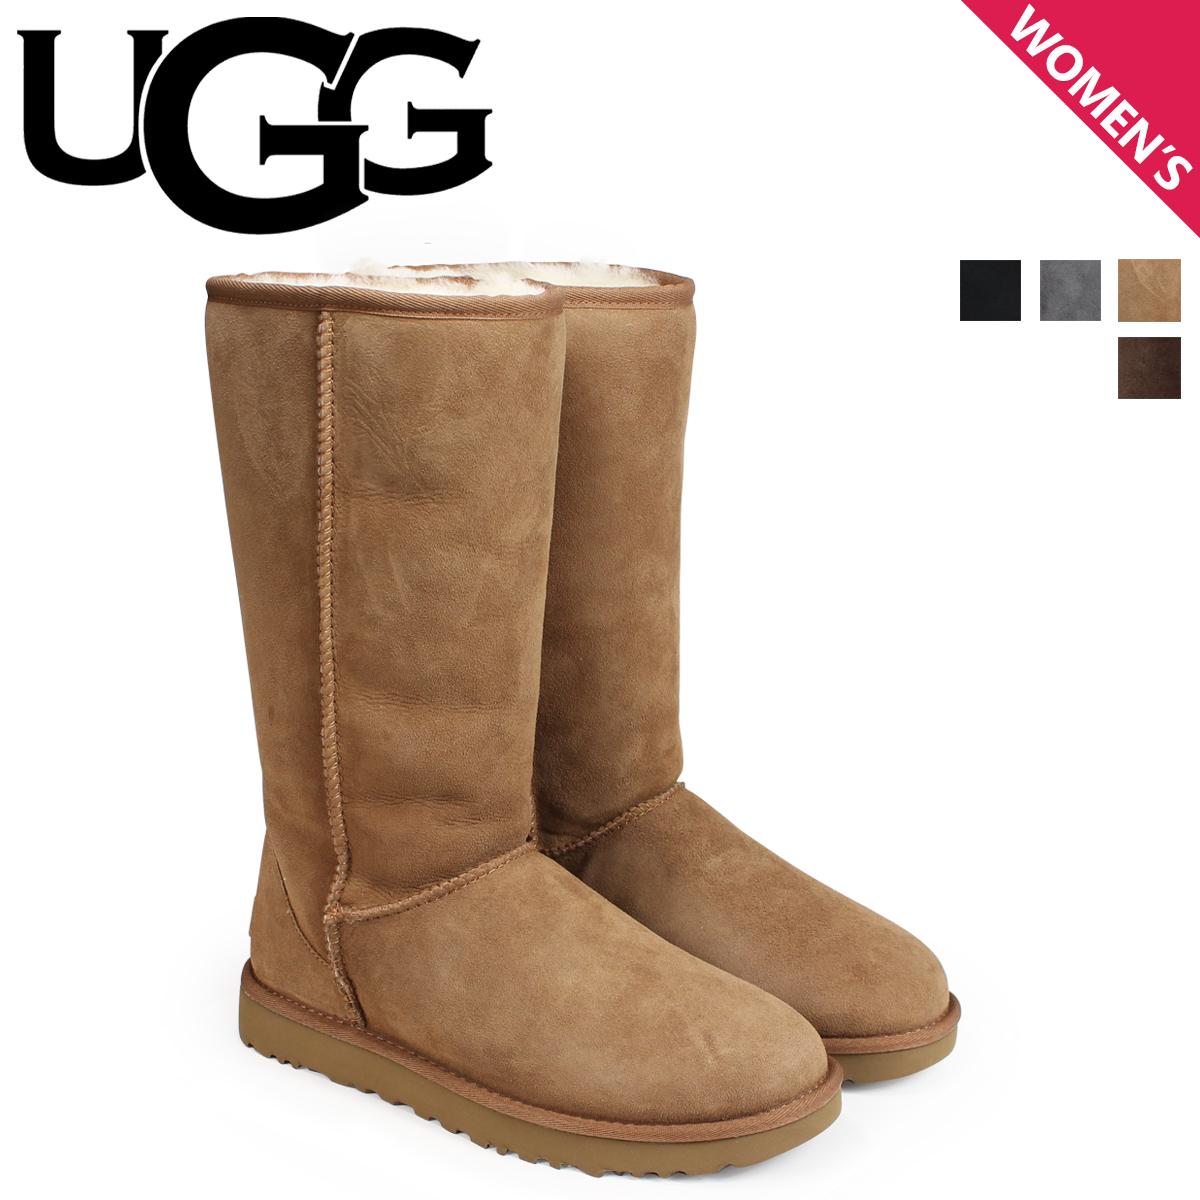 UGG アグ ムートン ブーツ クラシック トール CLASSIC TALL II BOOT 1016224 レディース [9/12 新入荷]